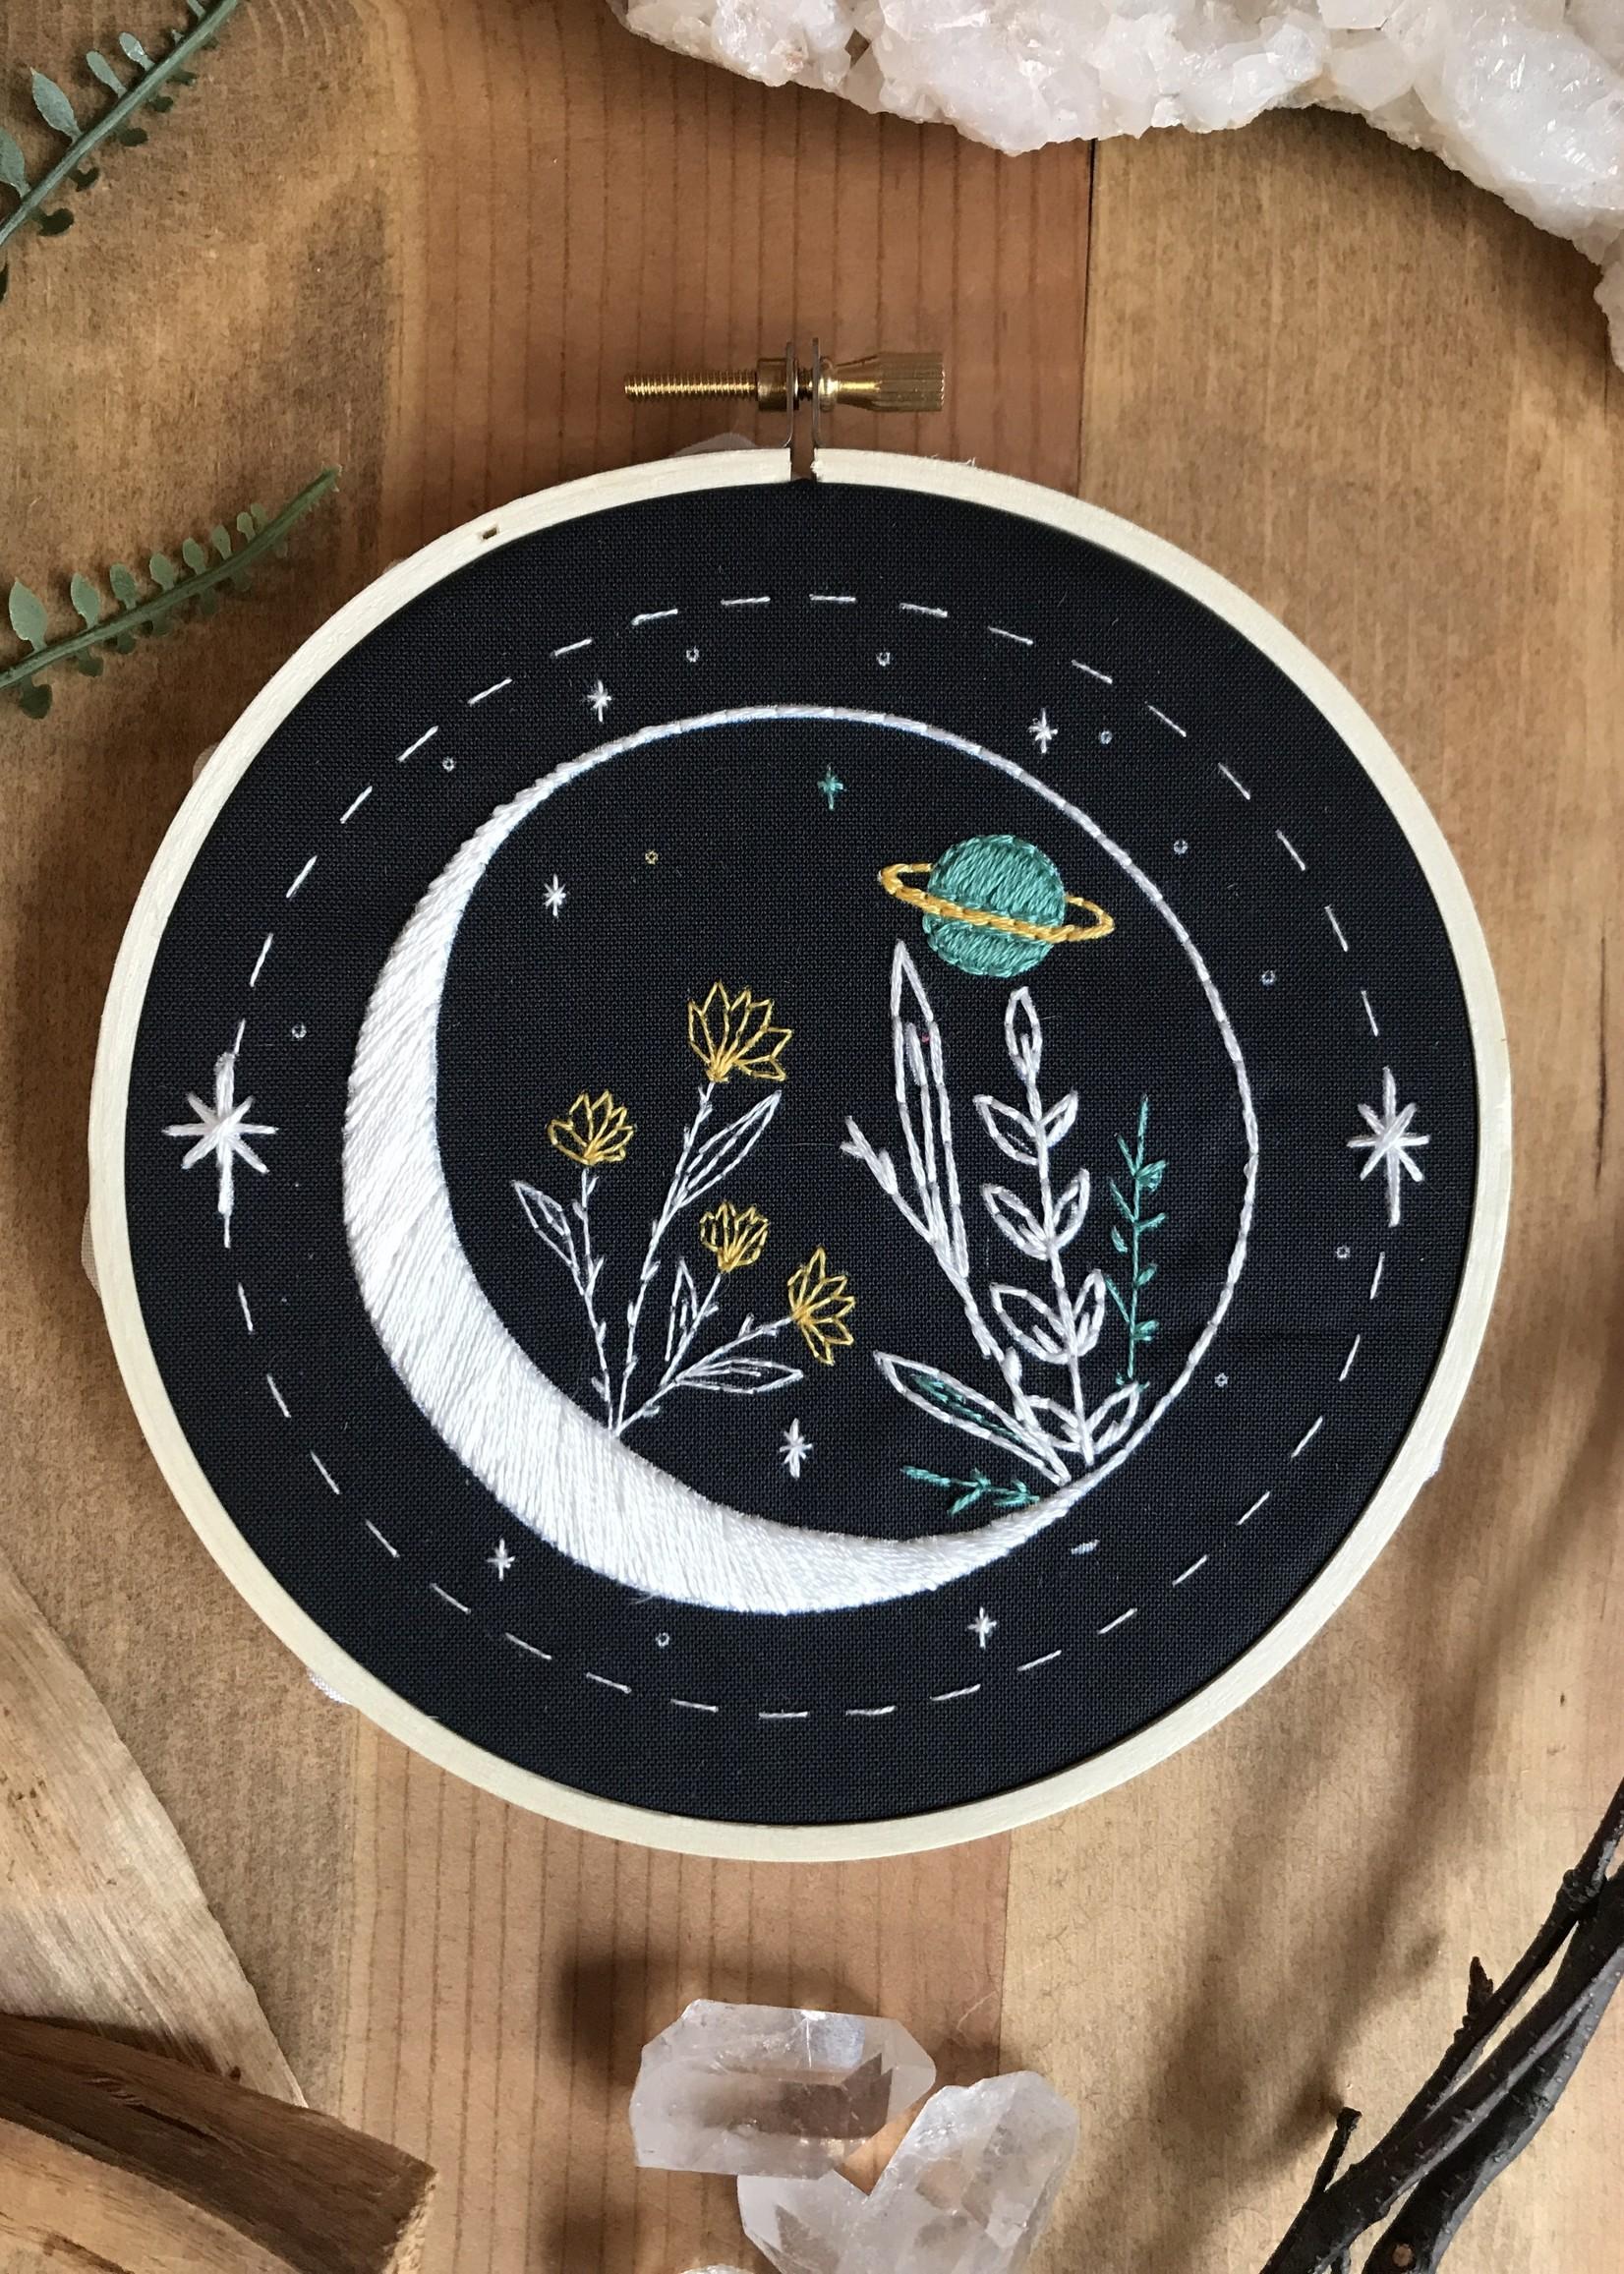 DIY Stitch Kit - Celestial Garden